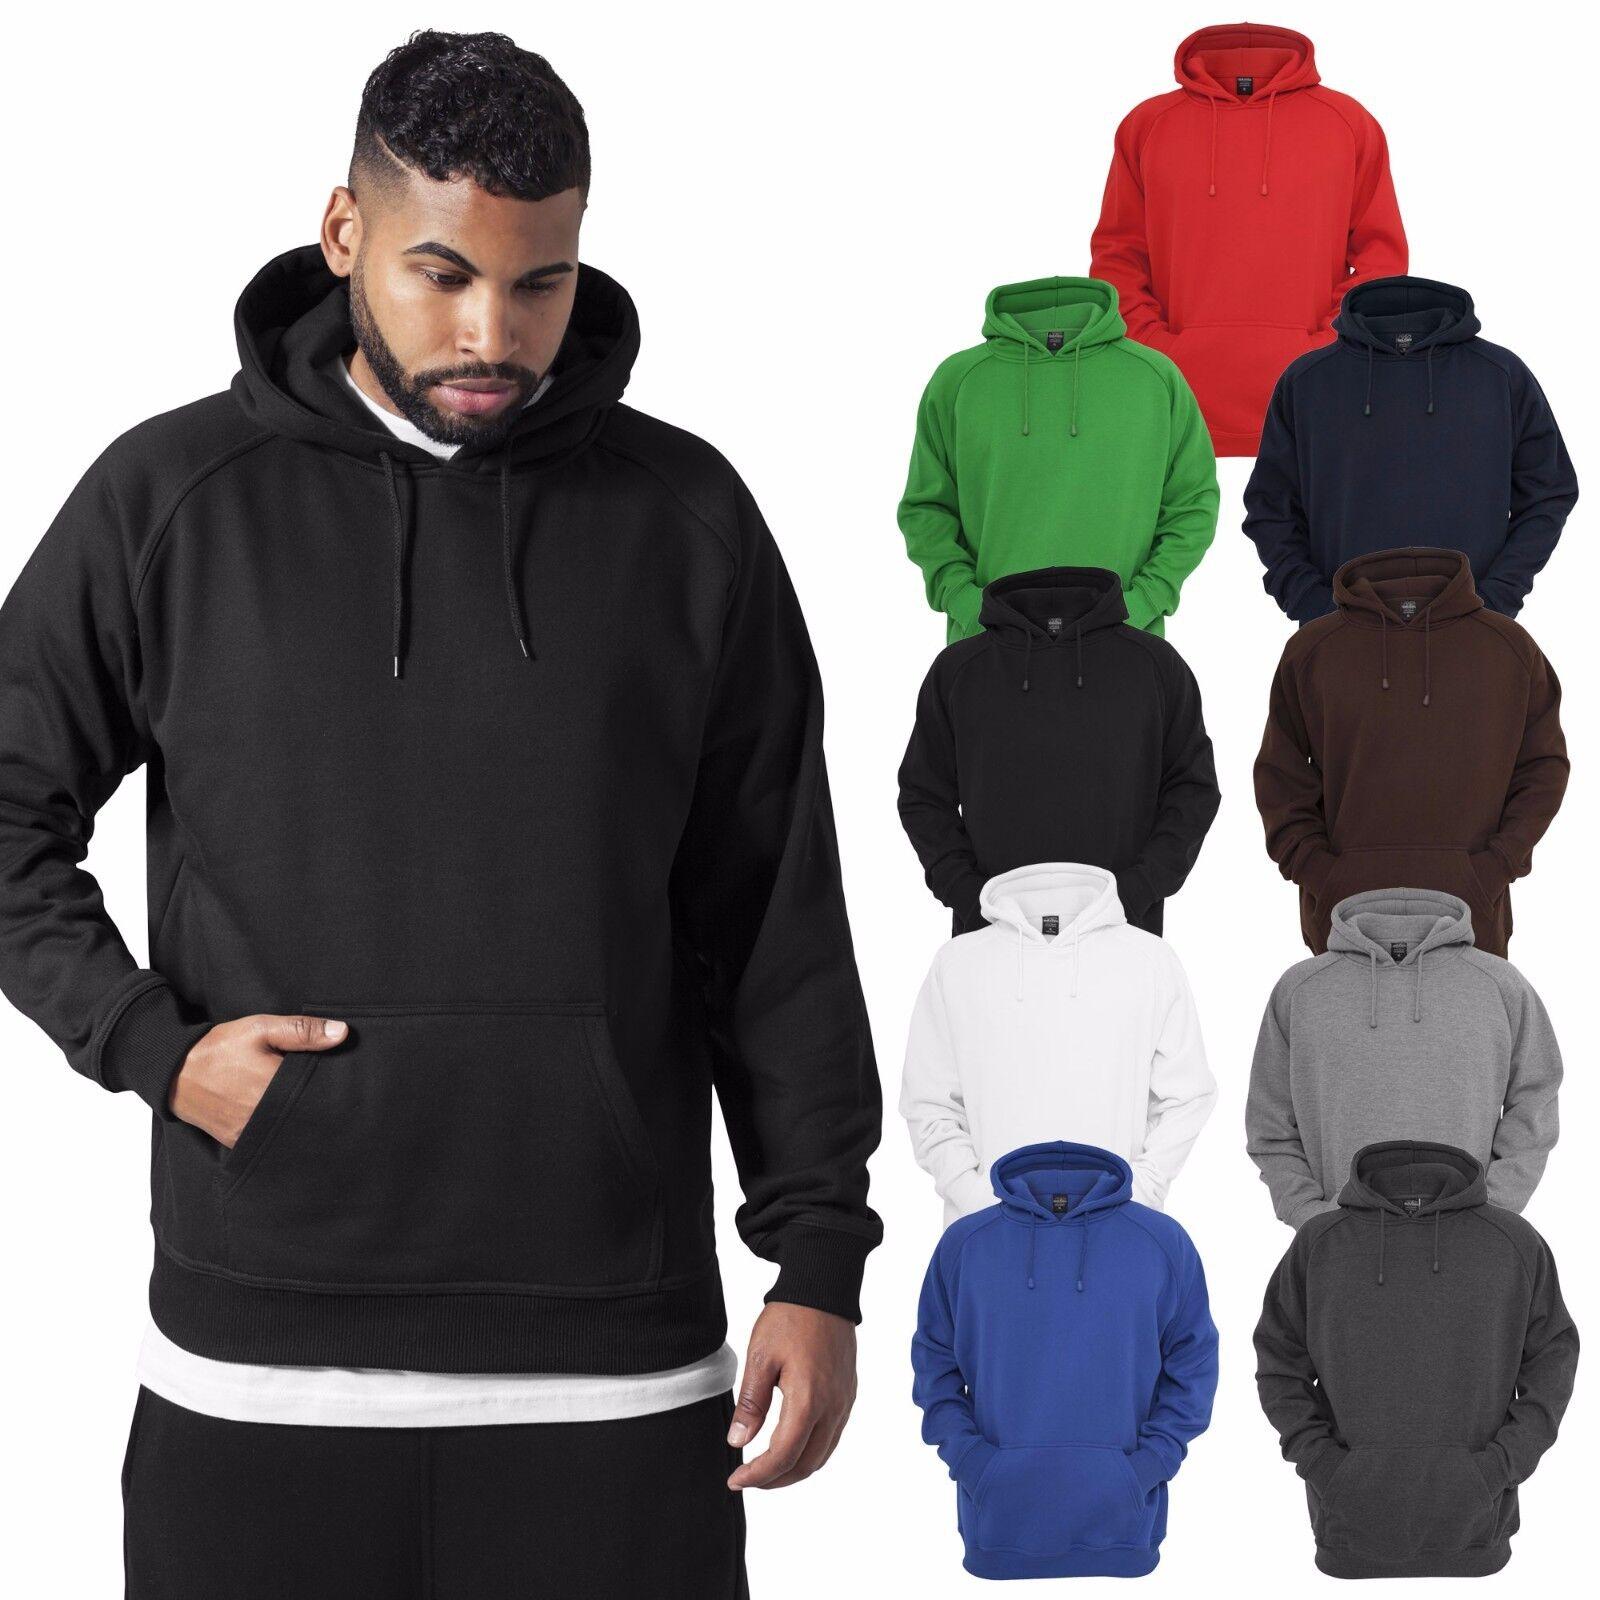 URBAN CLASSICS Blank Hoody Pullover Hoodie Sweatshirt Club Sport Fitness S - 5XL